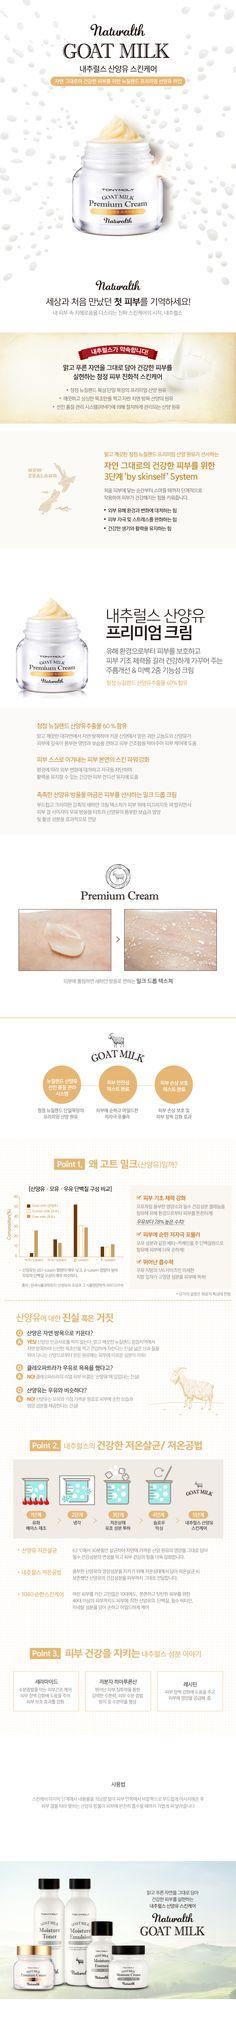 Tony Moly Naturalth Goal Milk Premium Cream | The Cutest Makeup